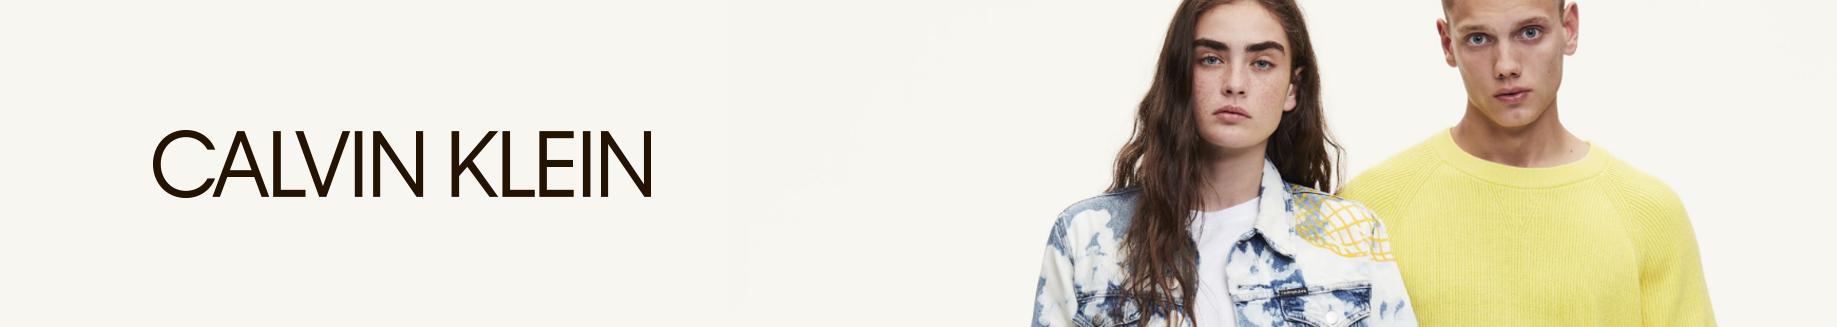 Білизна Calvin Klein